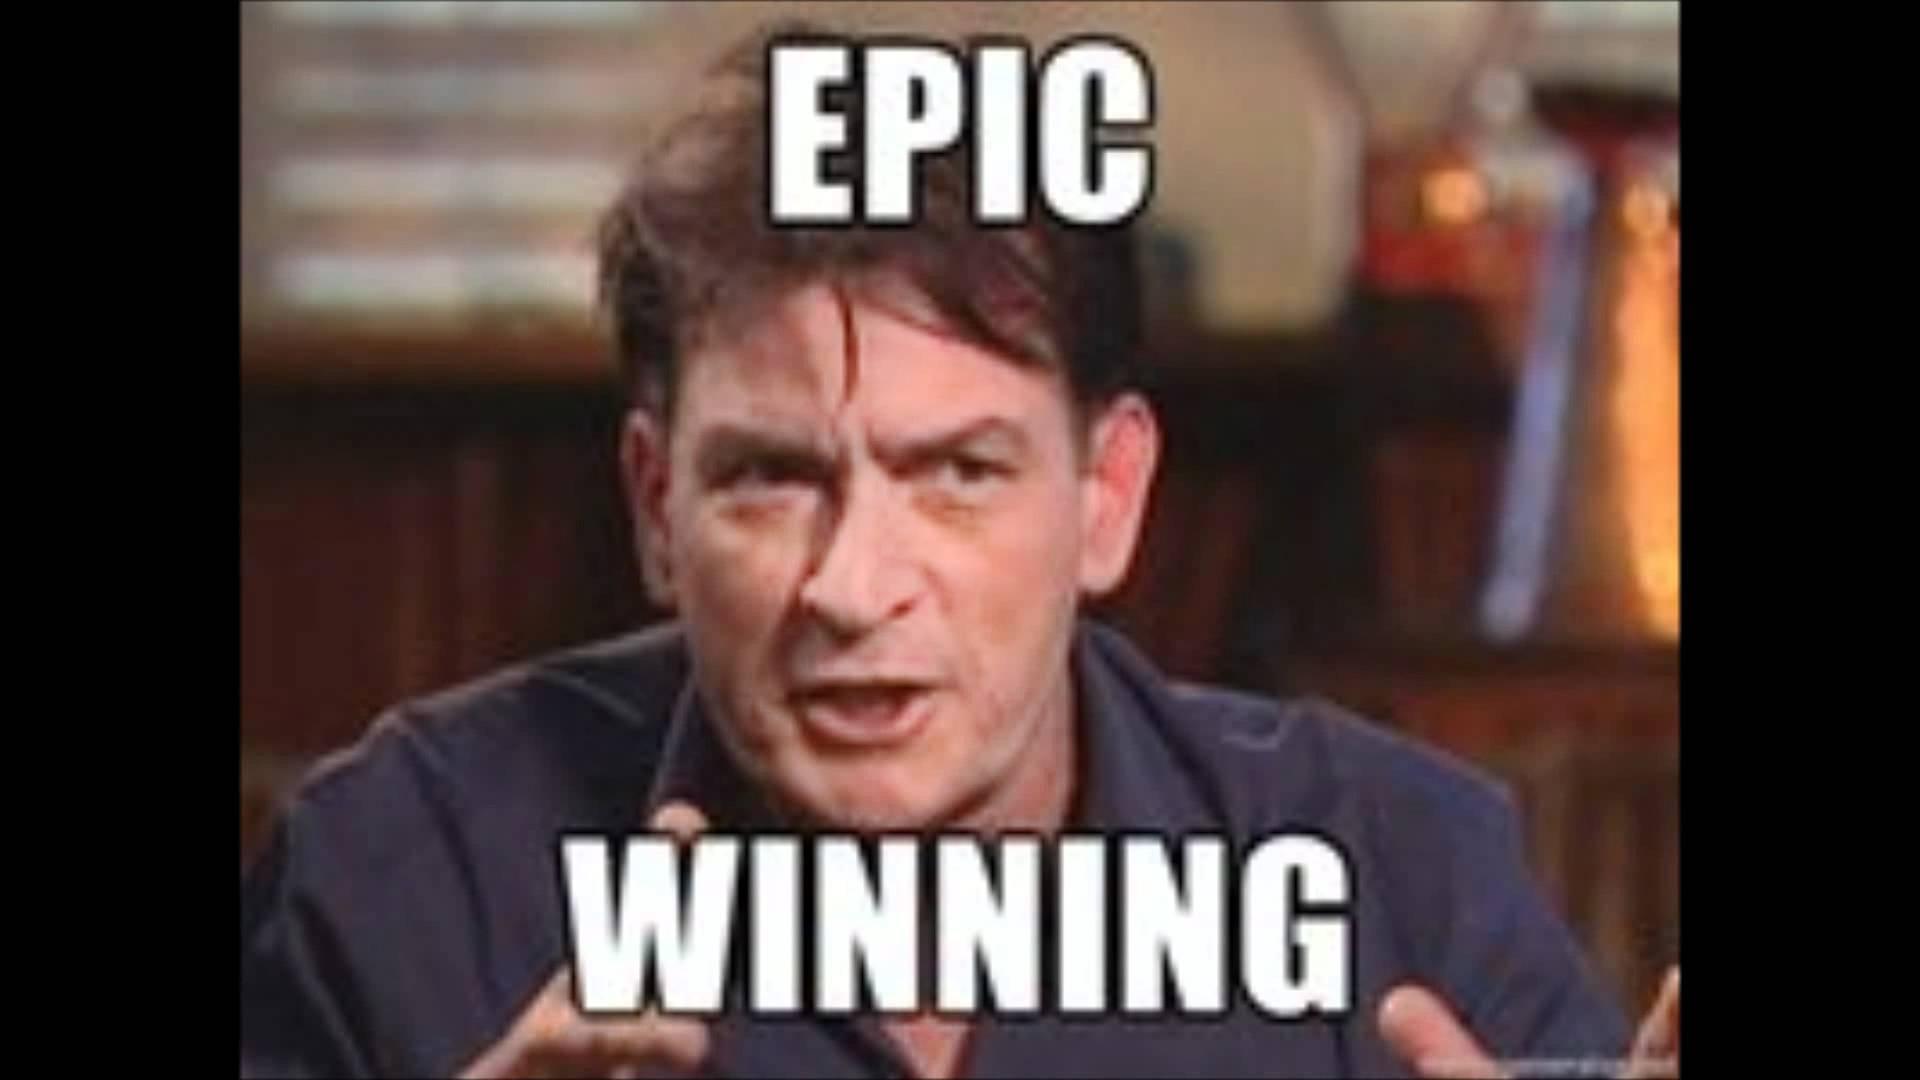 Charlie Sheen - Epic Winning